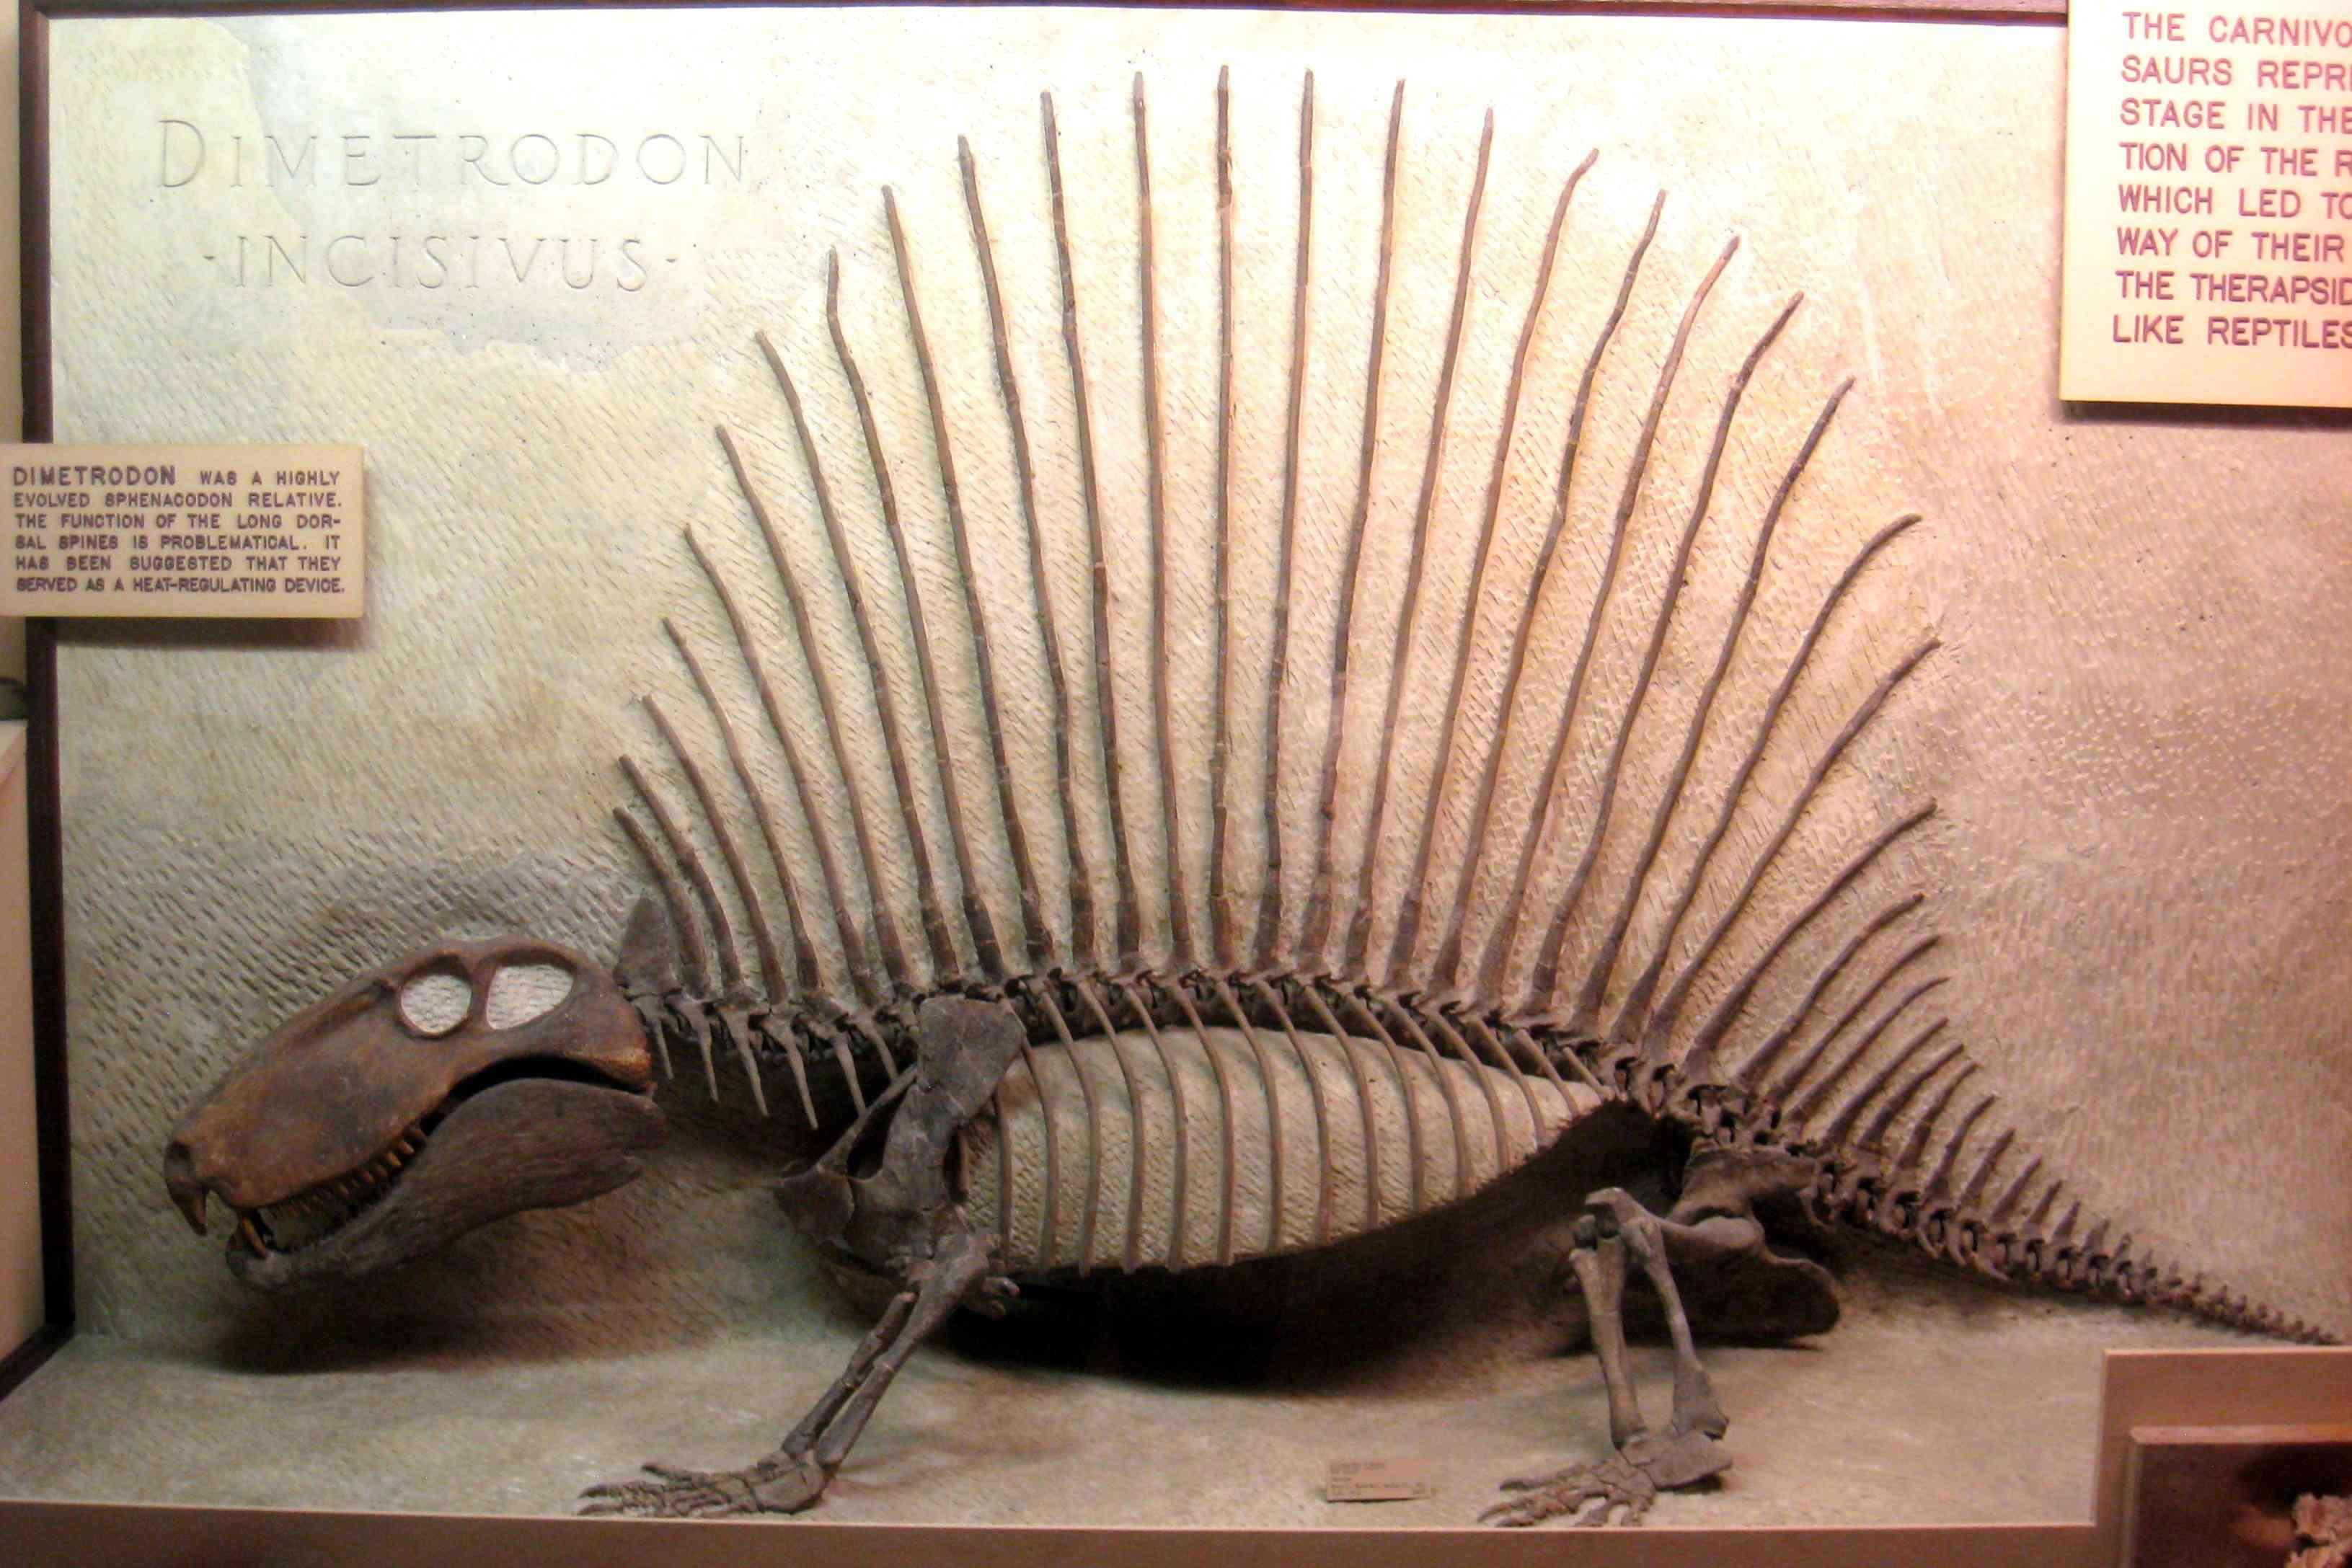 A Dimetrodon incisivus skeleton in an exhibit in Ann Arbor